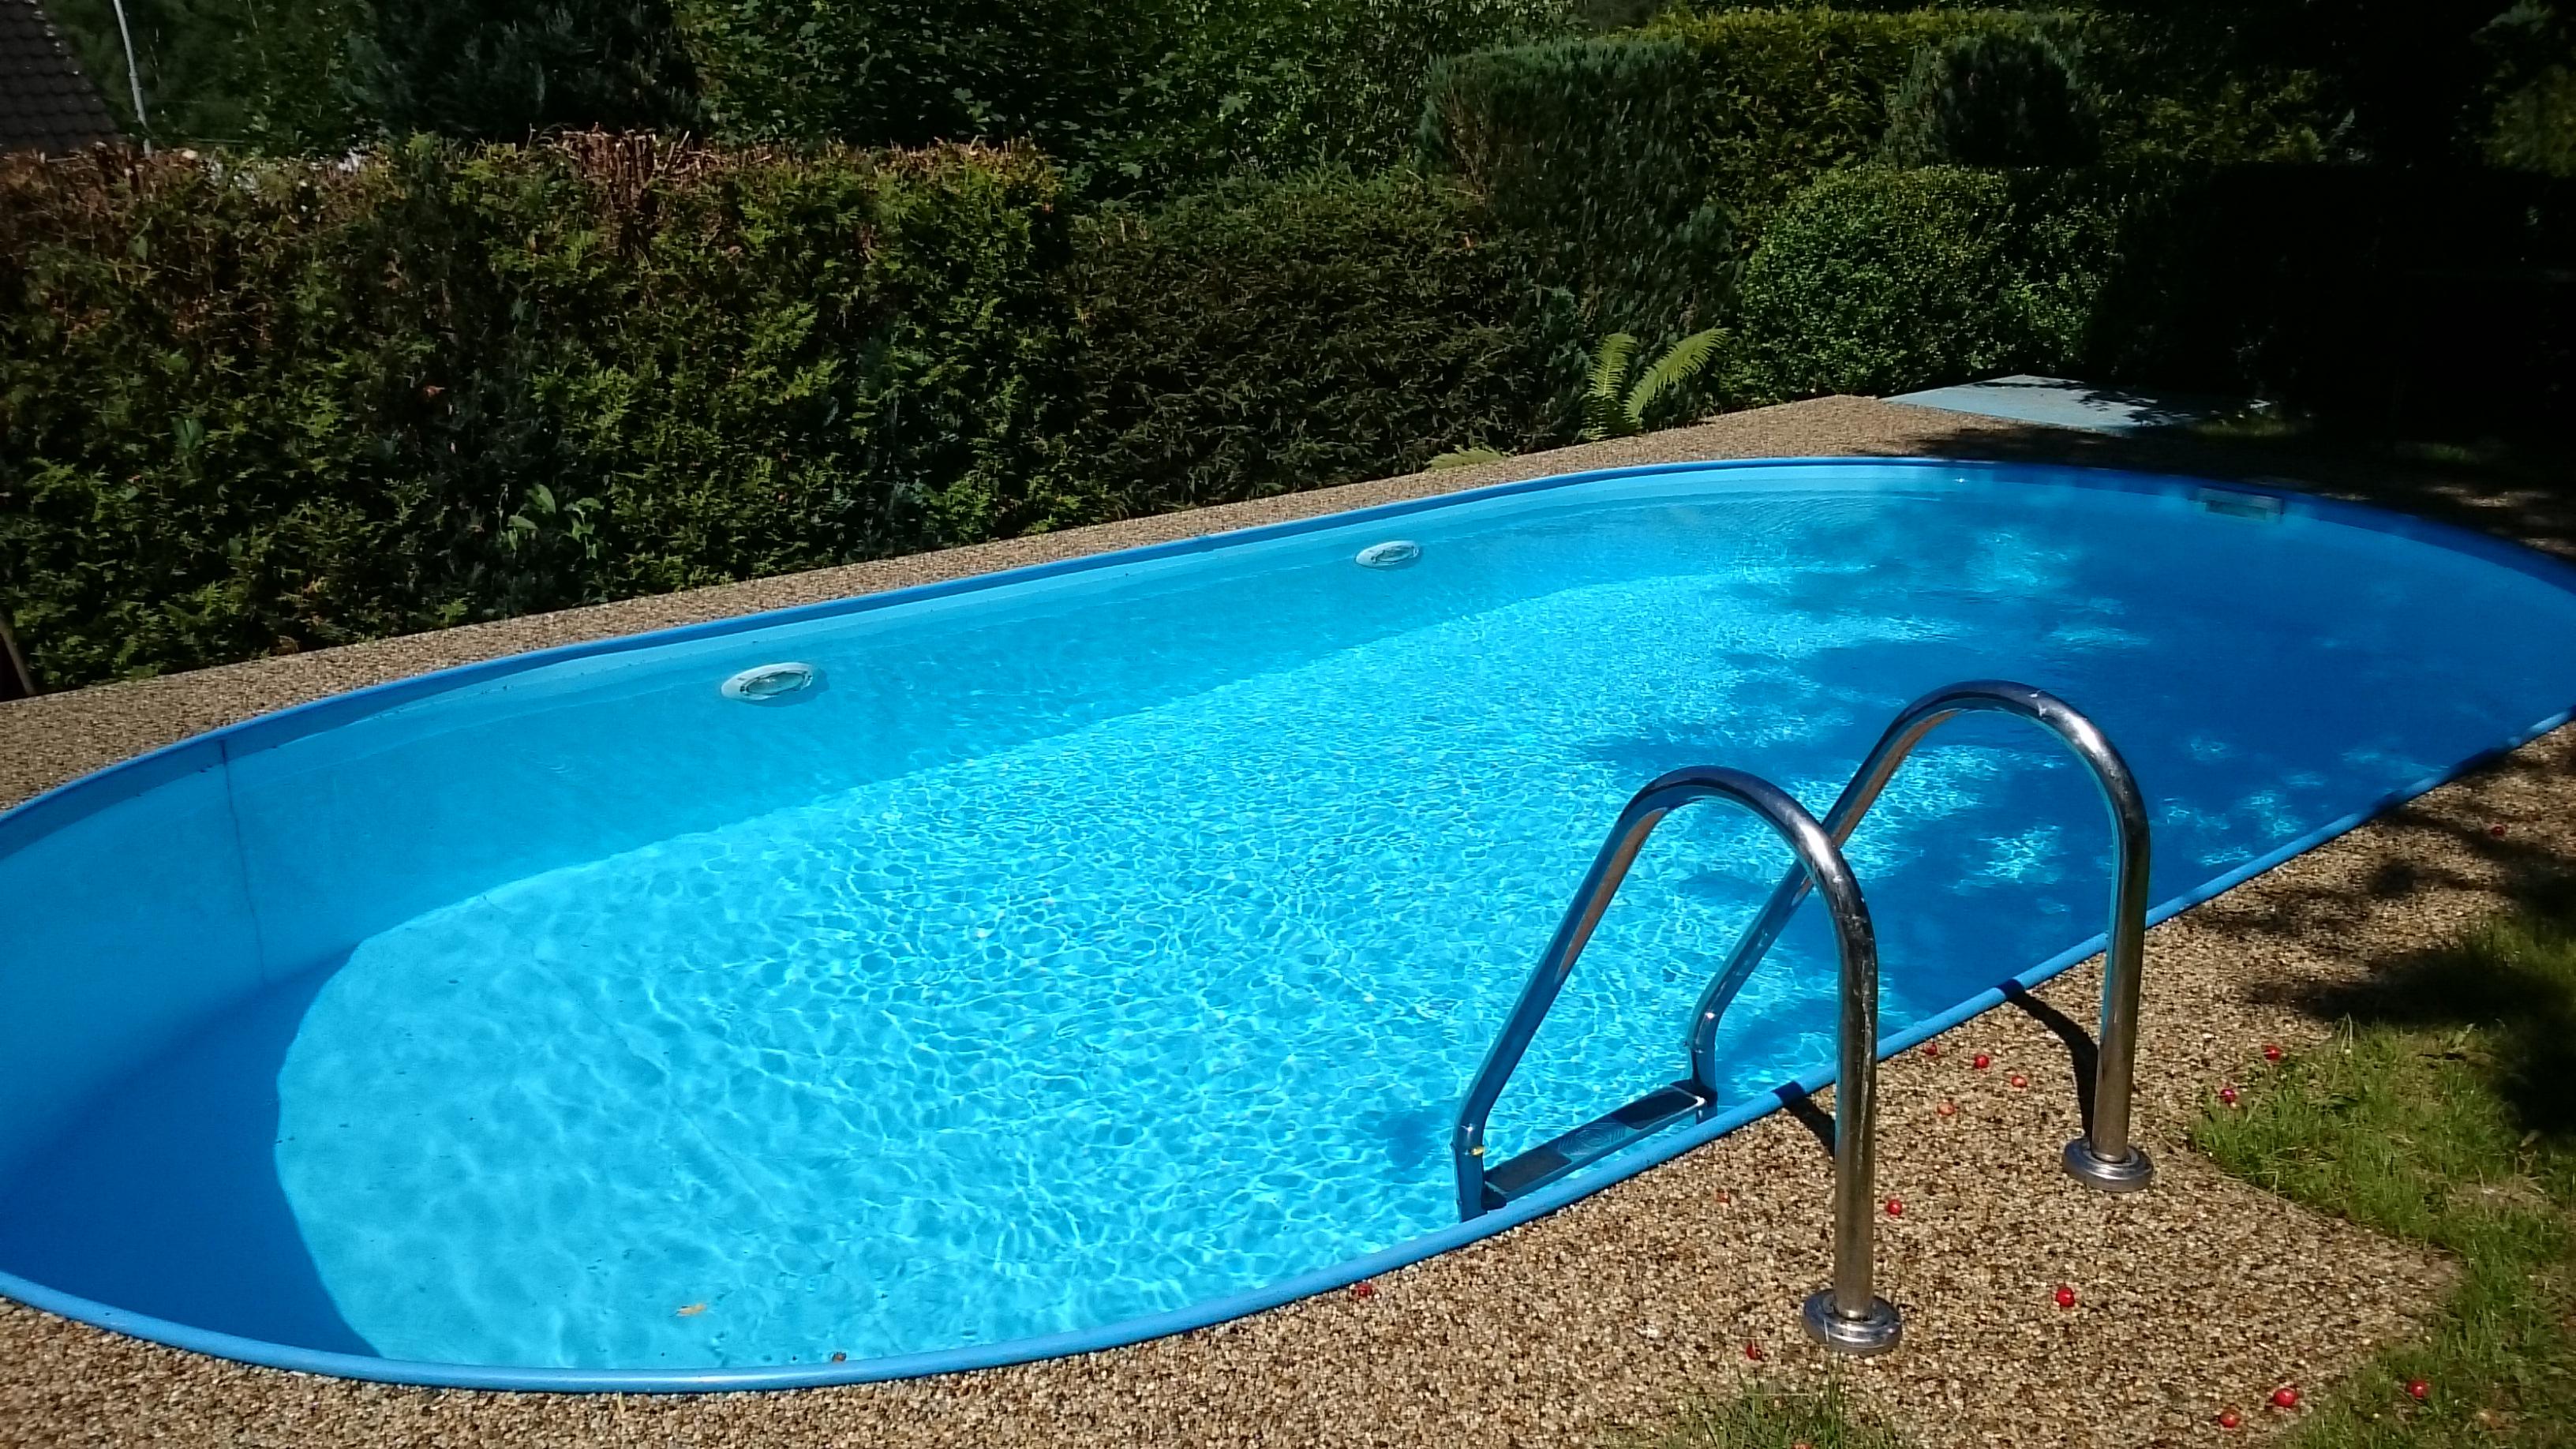 Venkovní bazén/ Outdoor Pool/ Freibad